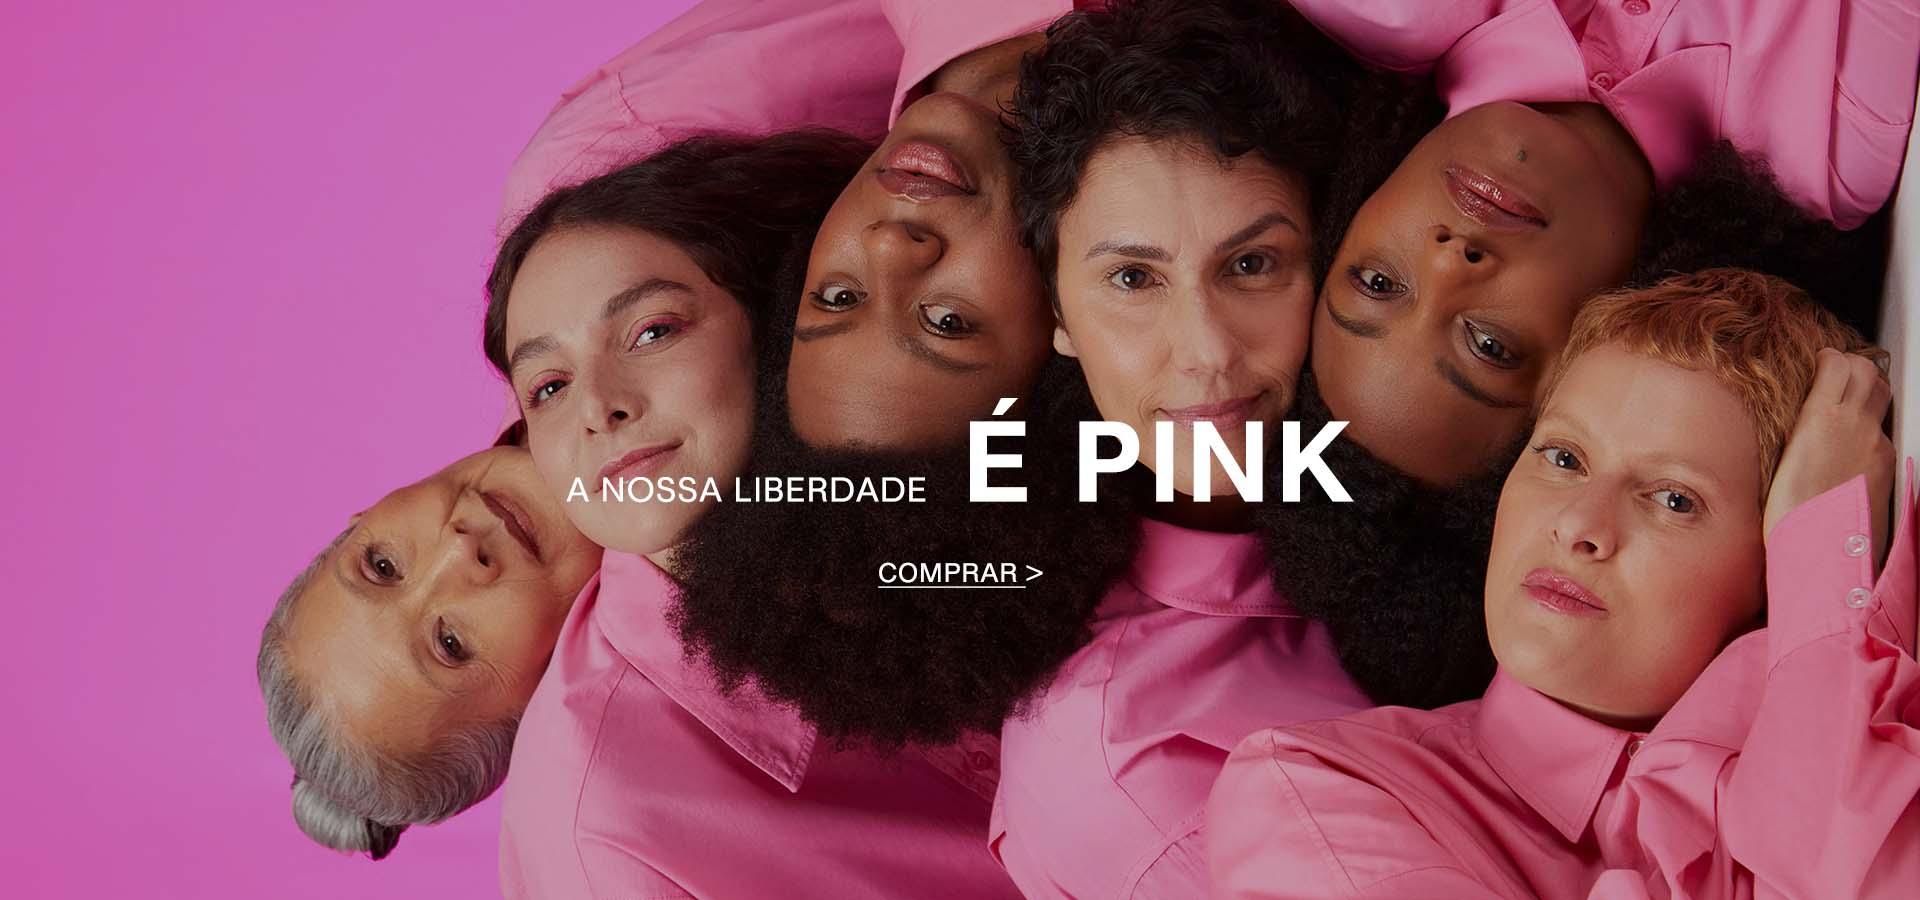 A nossa liberdade é pink